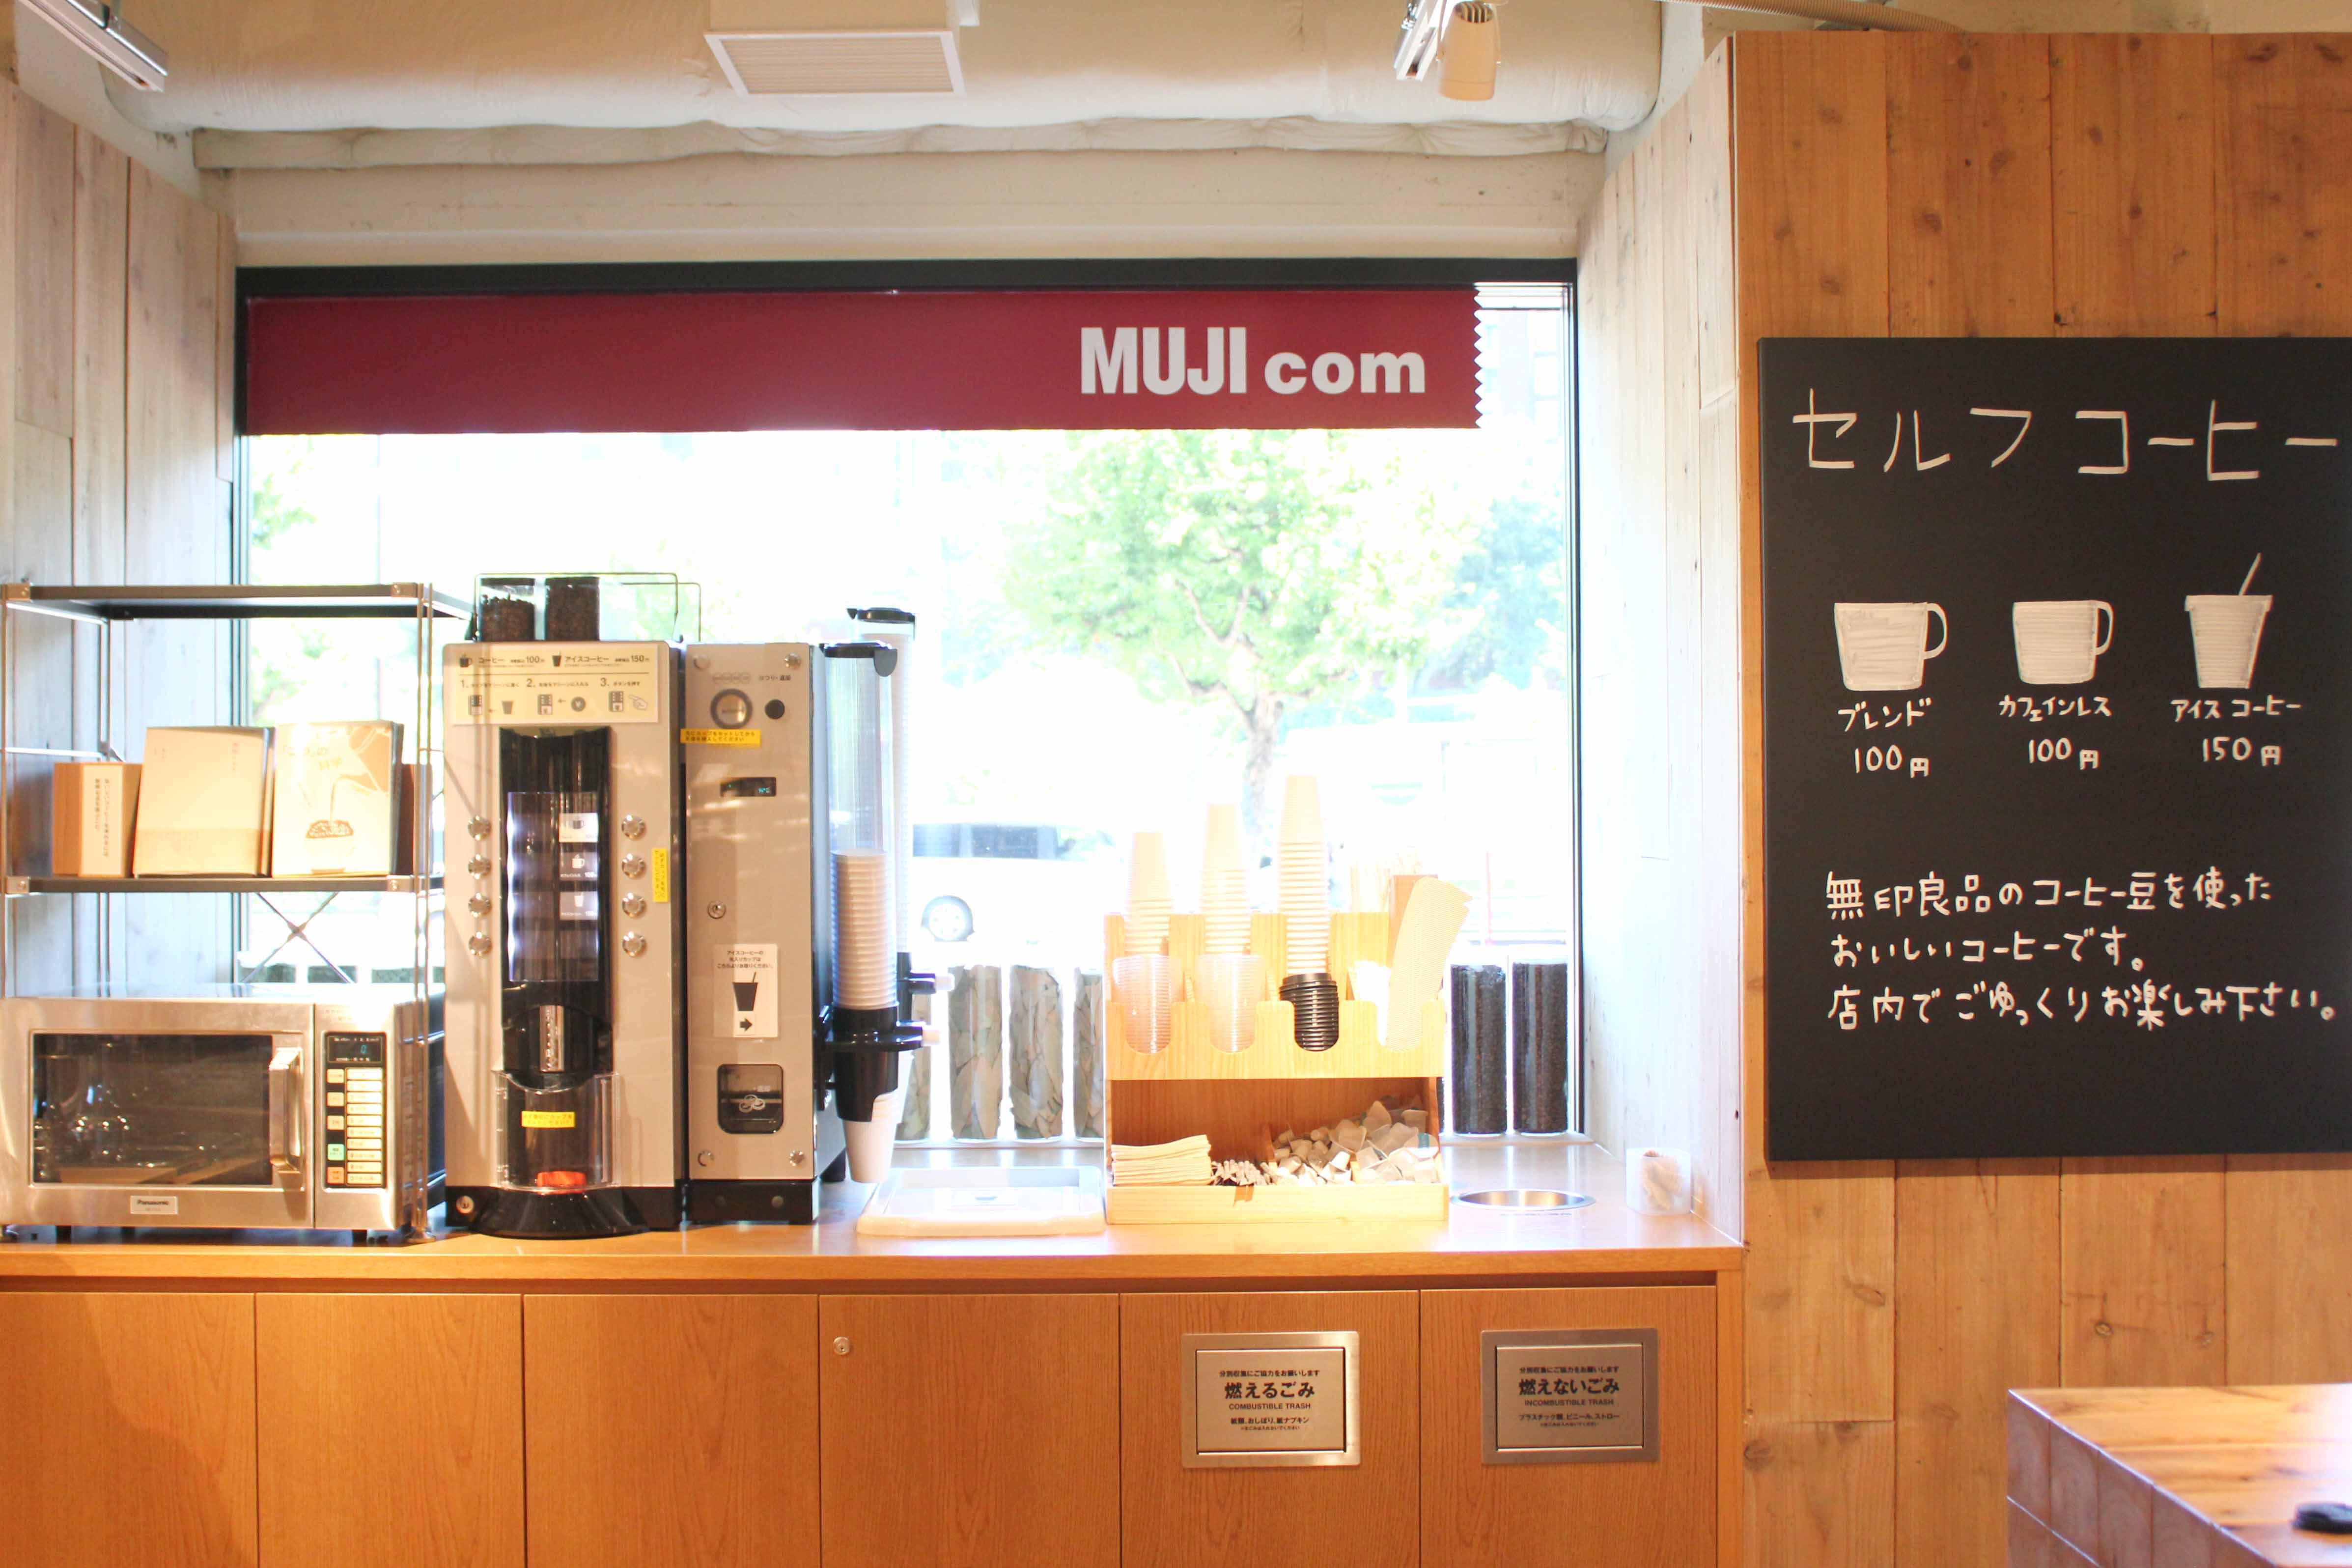 MUJI com 武蔵野美術大学市ヶ谷キャンパス MUJIコーヒー